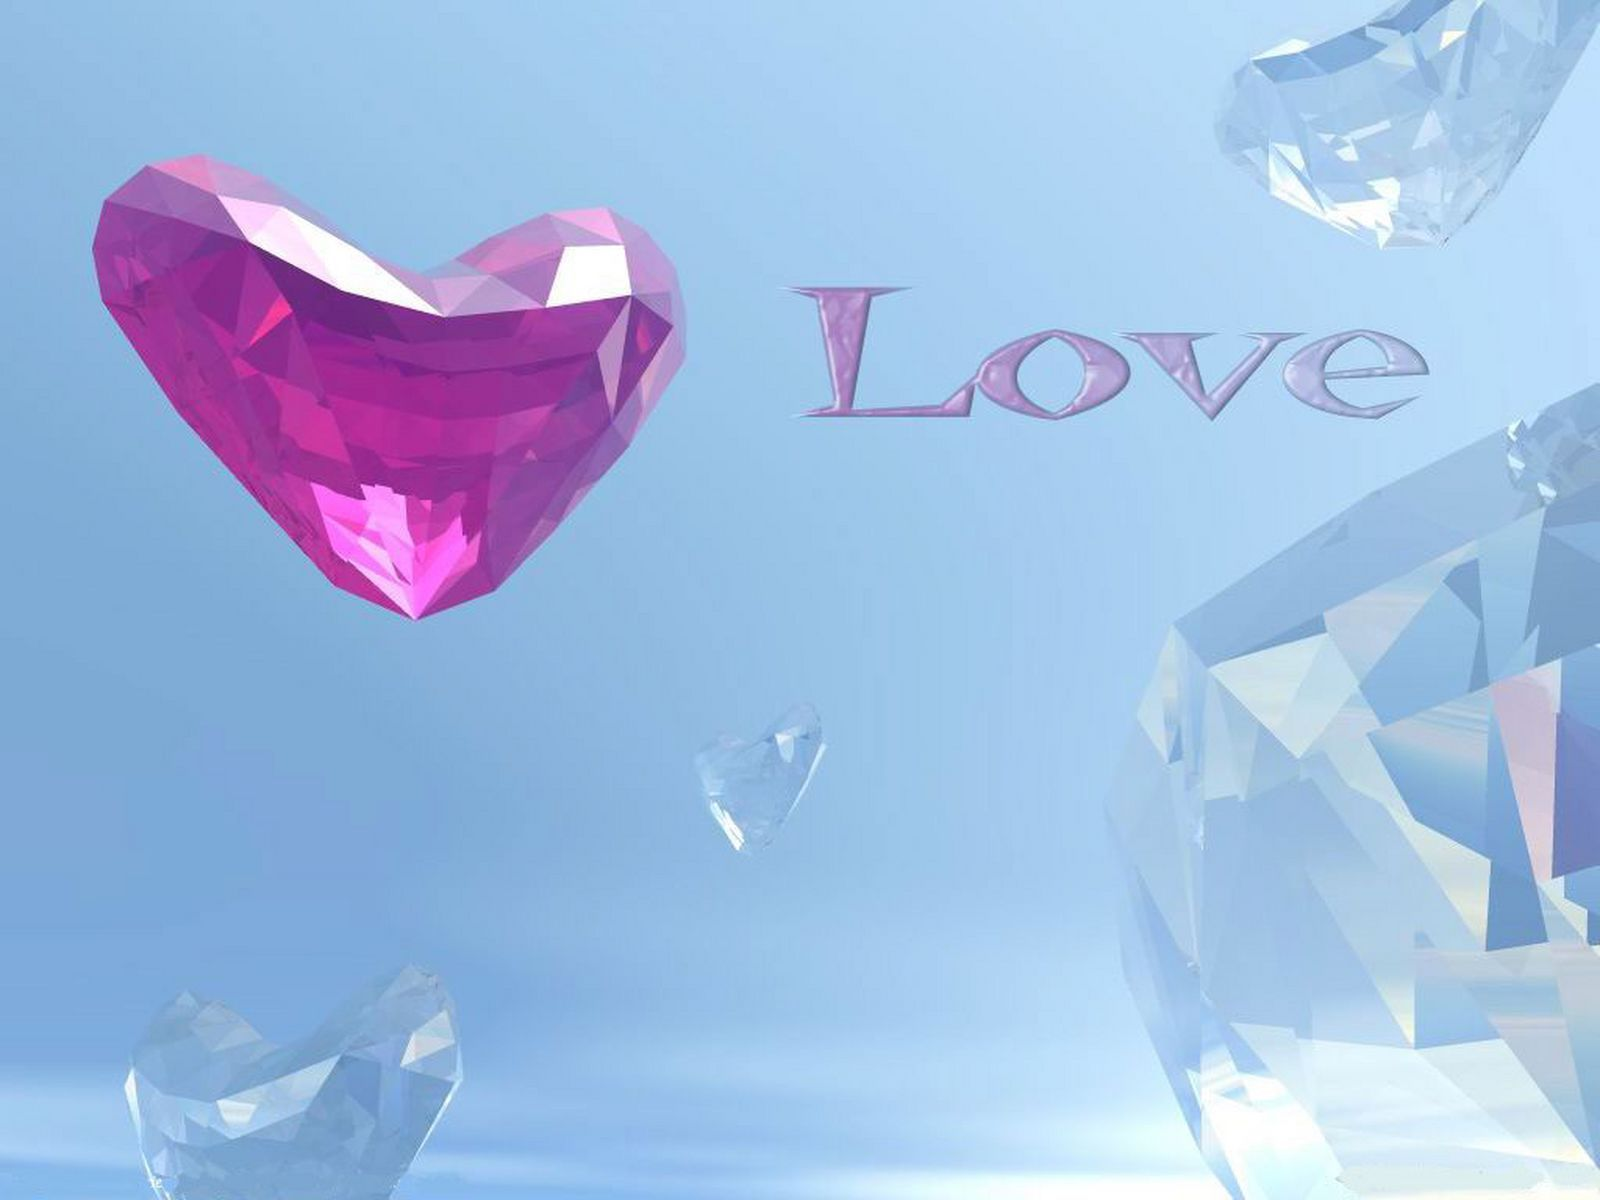 http://3.bp.blogspot.com/-ESUljEyqA7E/Tcpl3ko7VhI/AAAAAAAAAAM/yppTyeZyX10/s1600/Love-Wallpaper-love-2939260-1600-1200.jpg